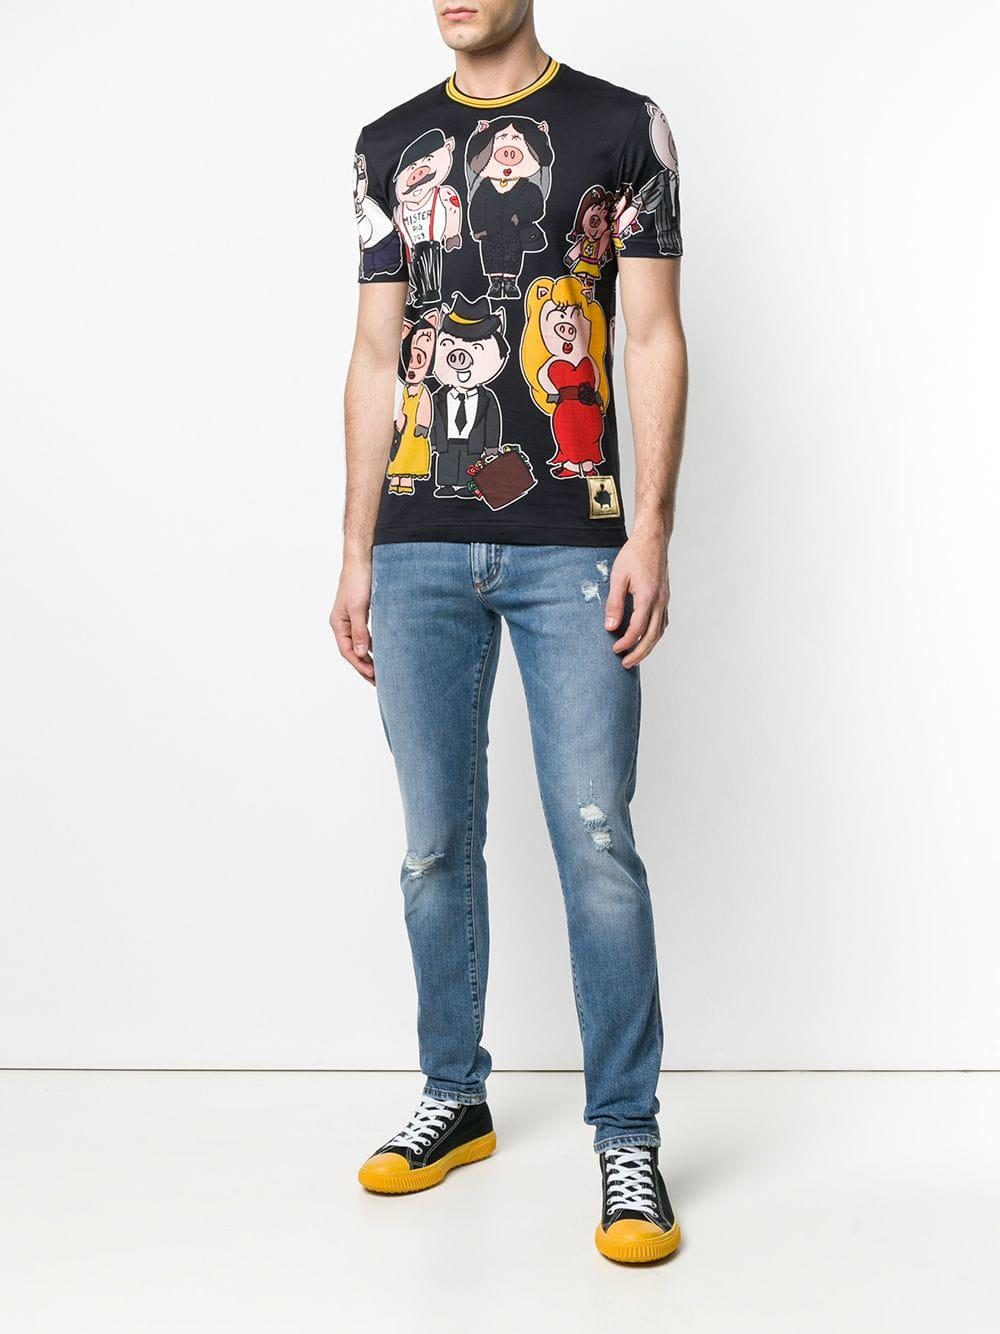 2a9996b5b0 Lyst - Dolce   Gabbana Family Pig T-shirt in Black for Men